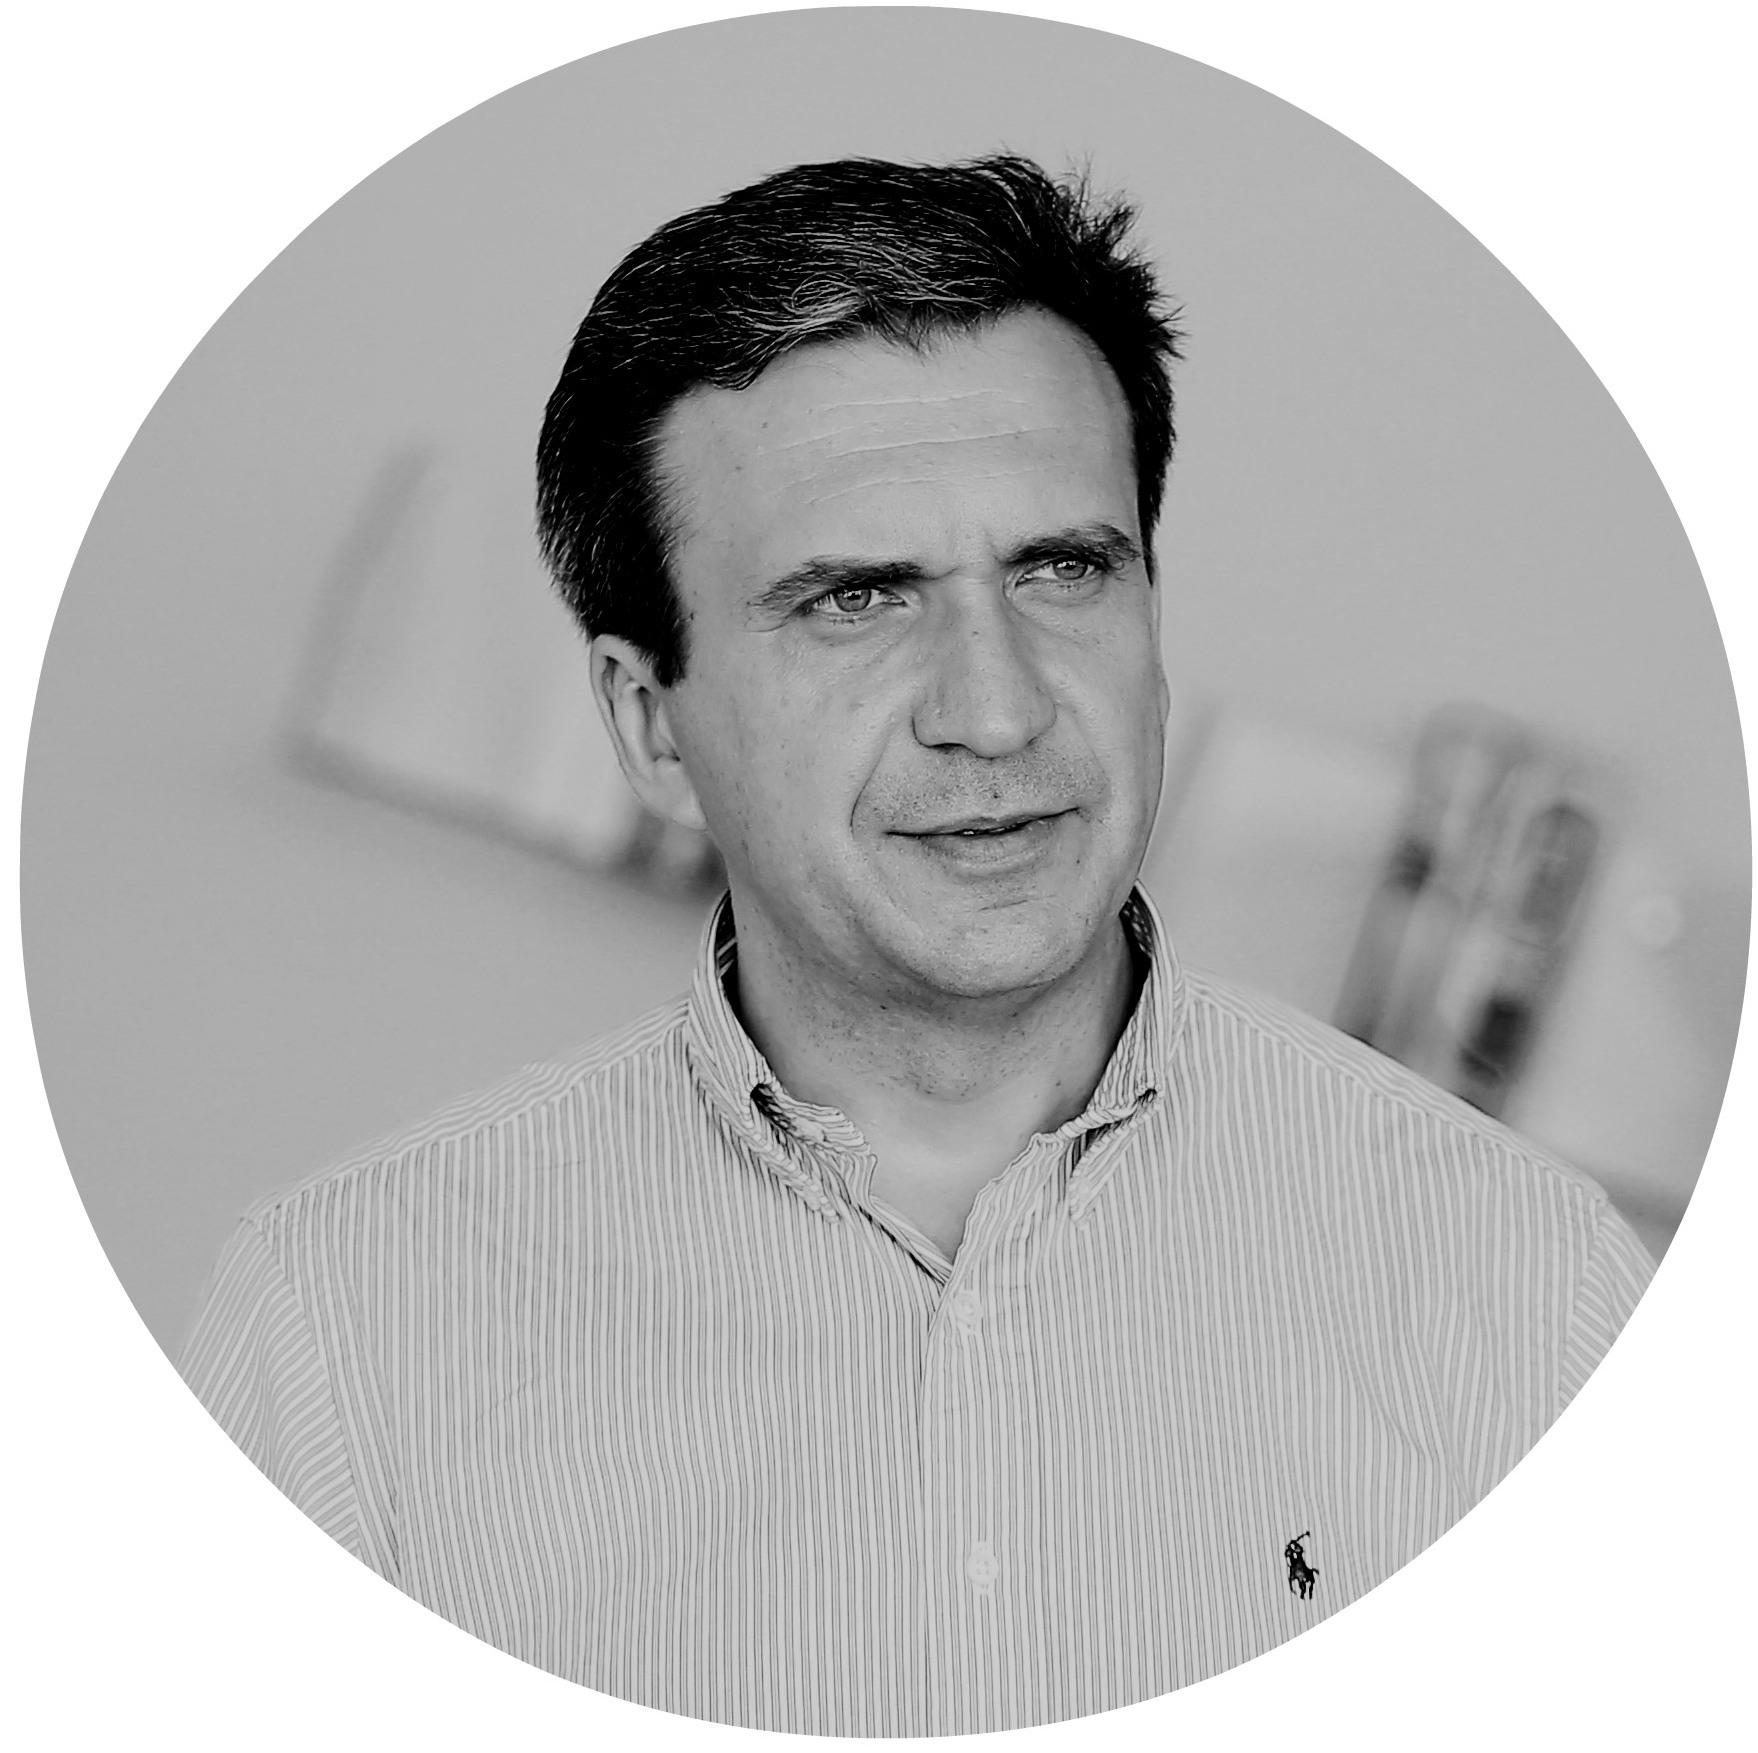 Pavlo Sheremeta